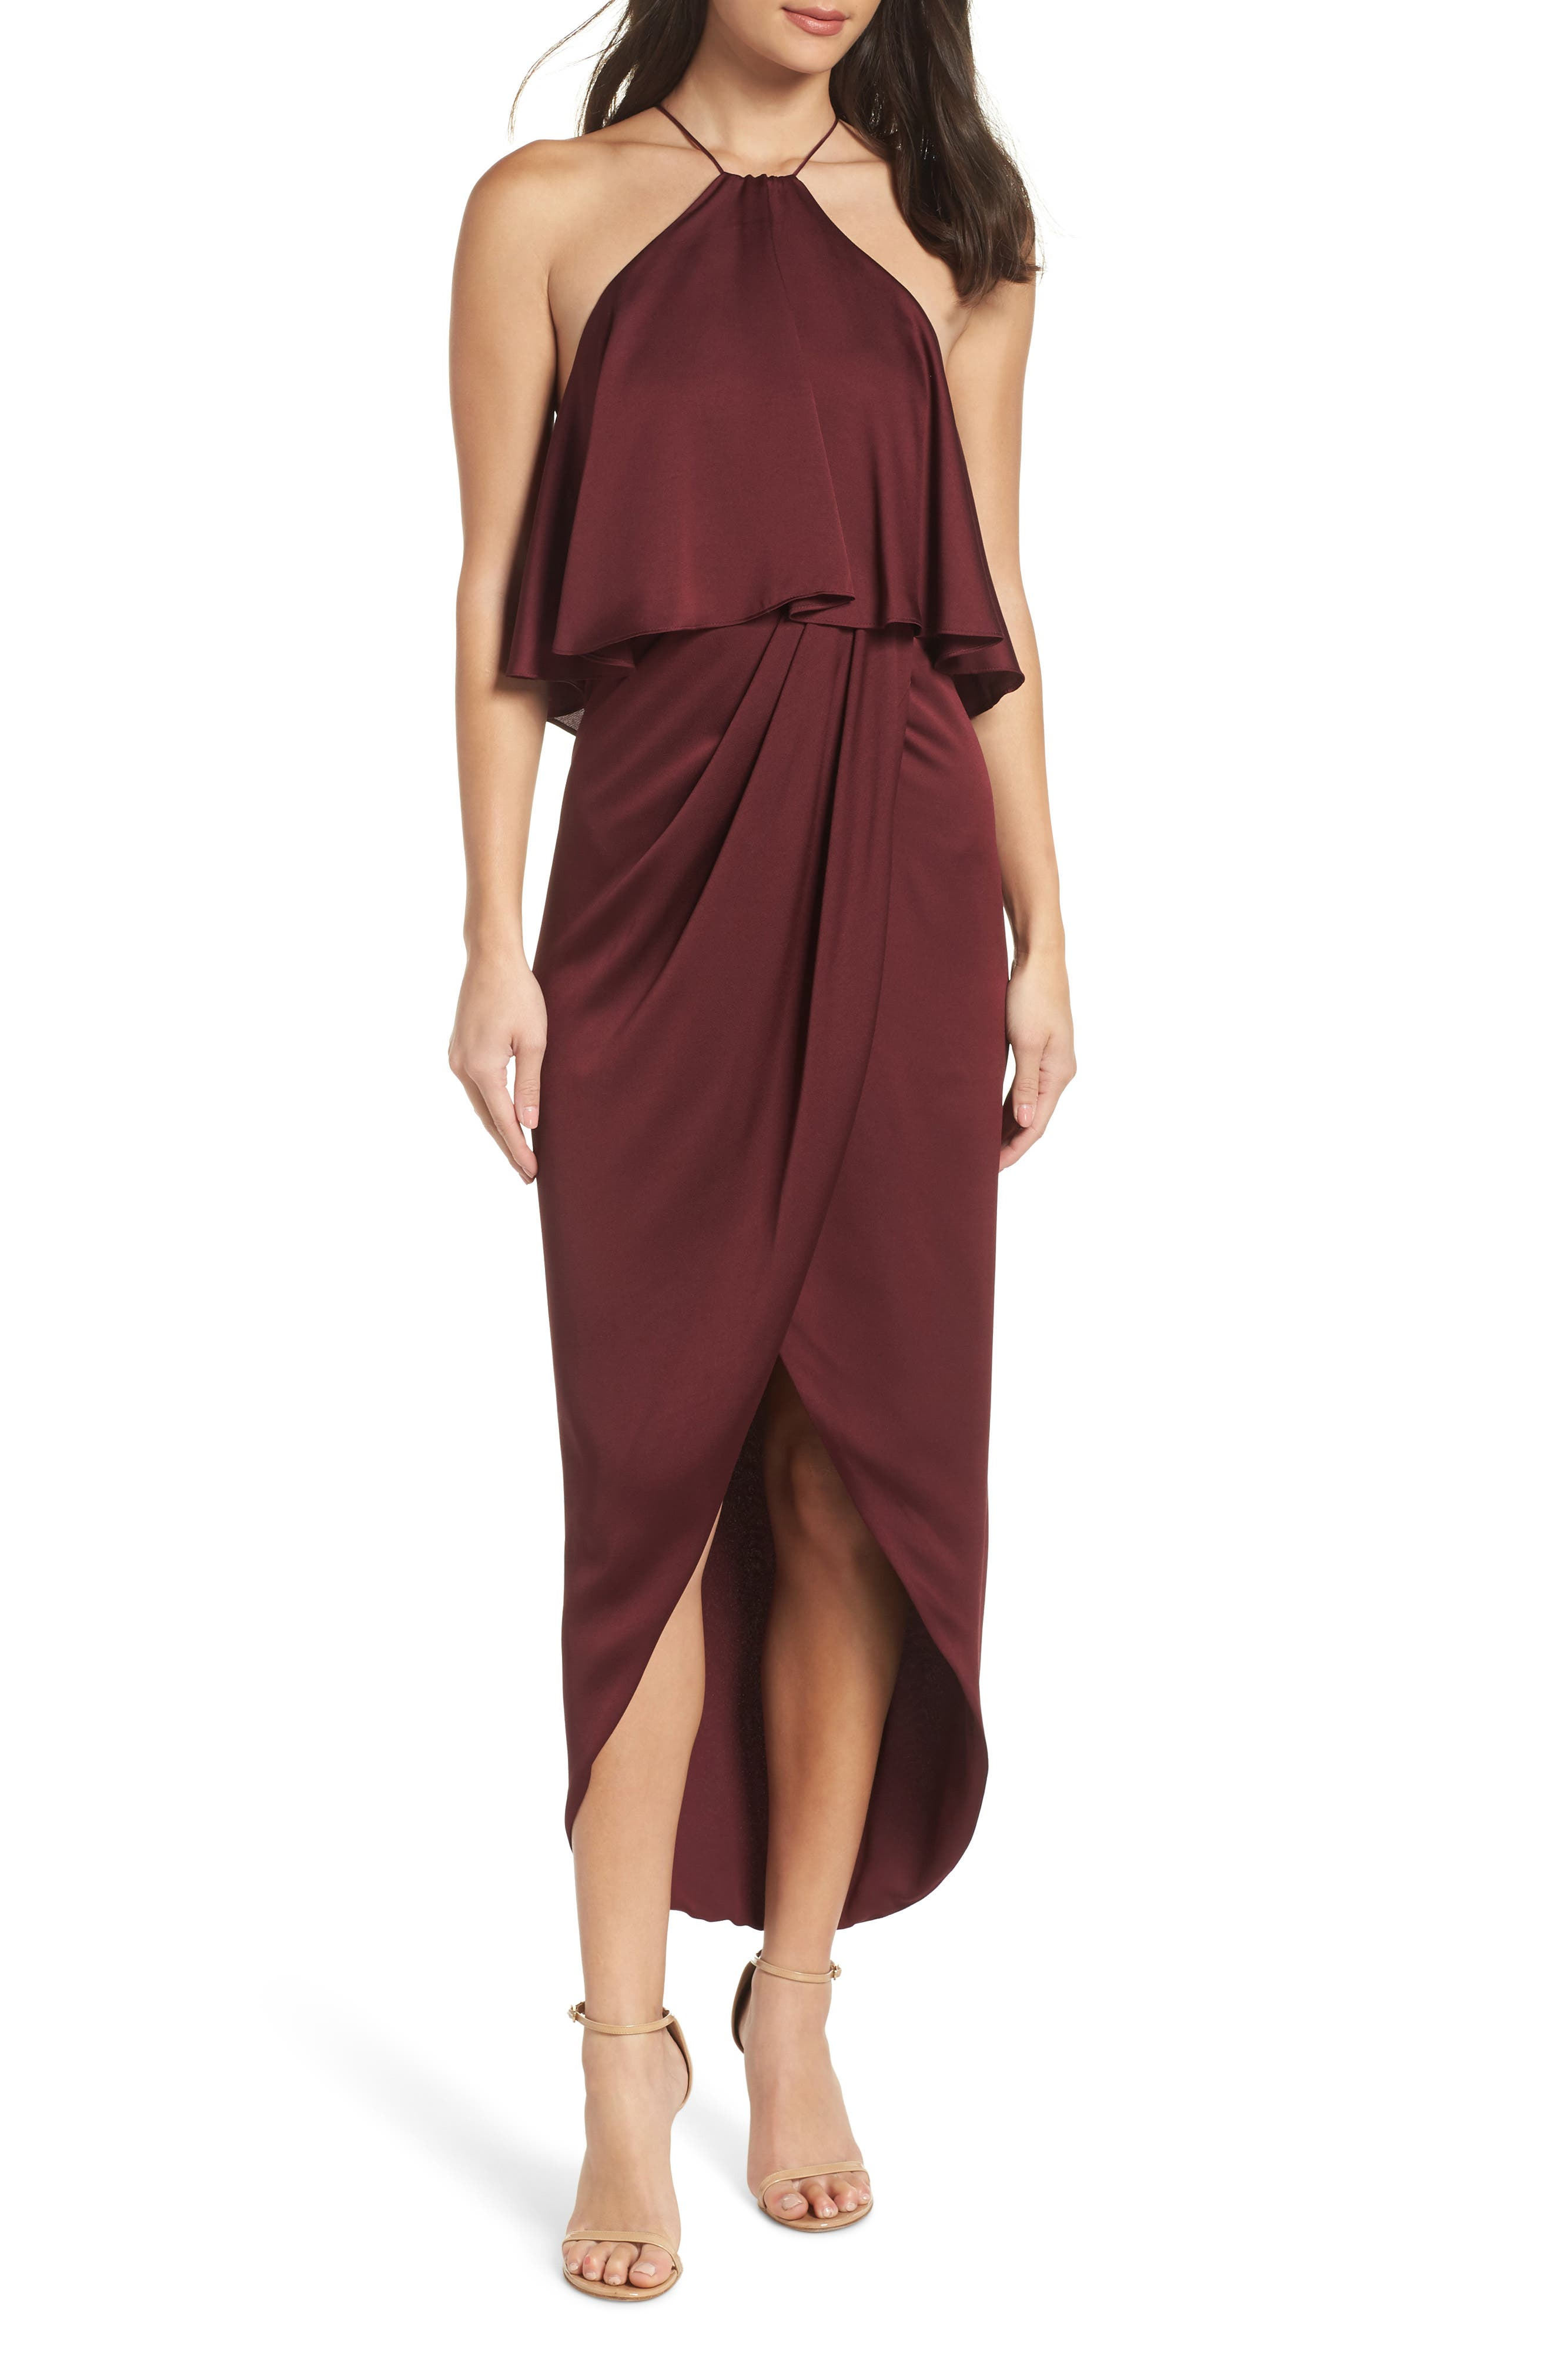 SHONA JOY Ruffle Halter Tulip Gown in Garnet